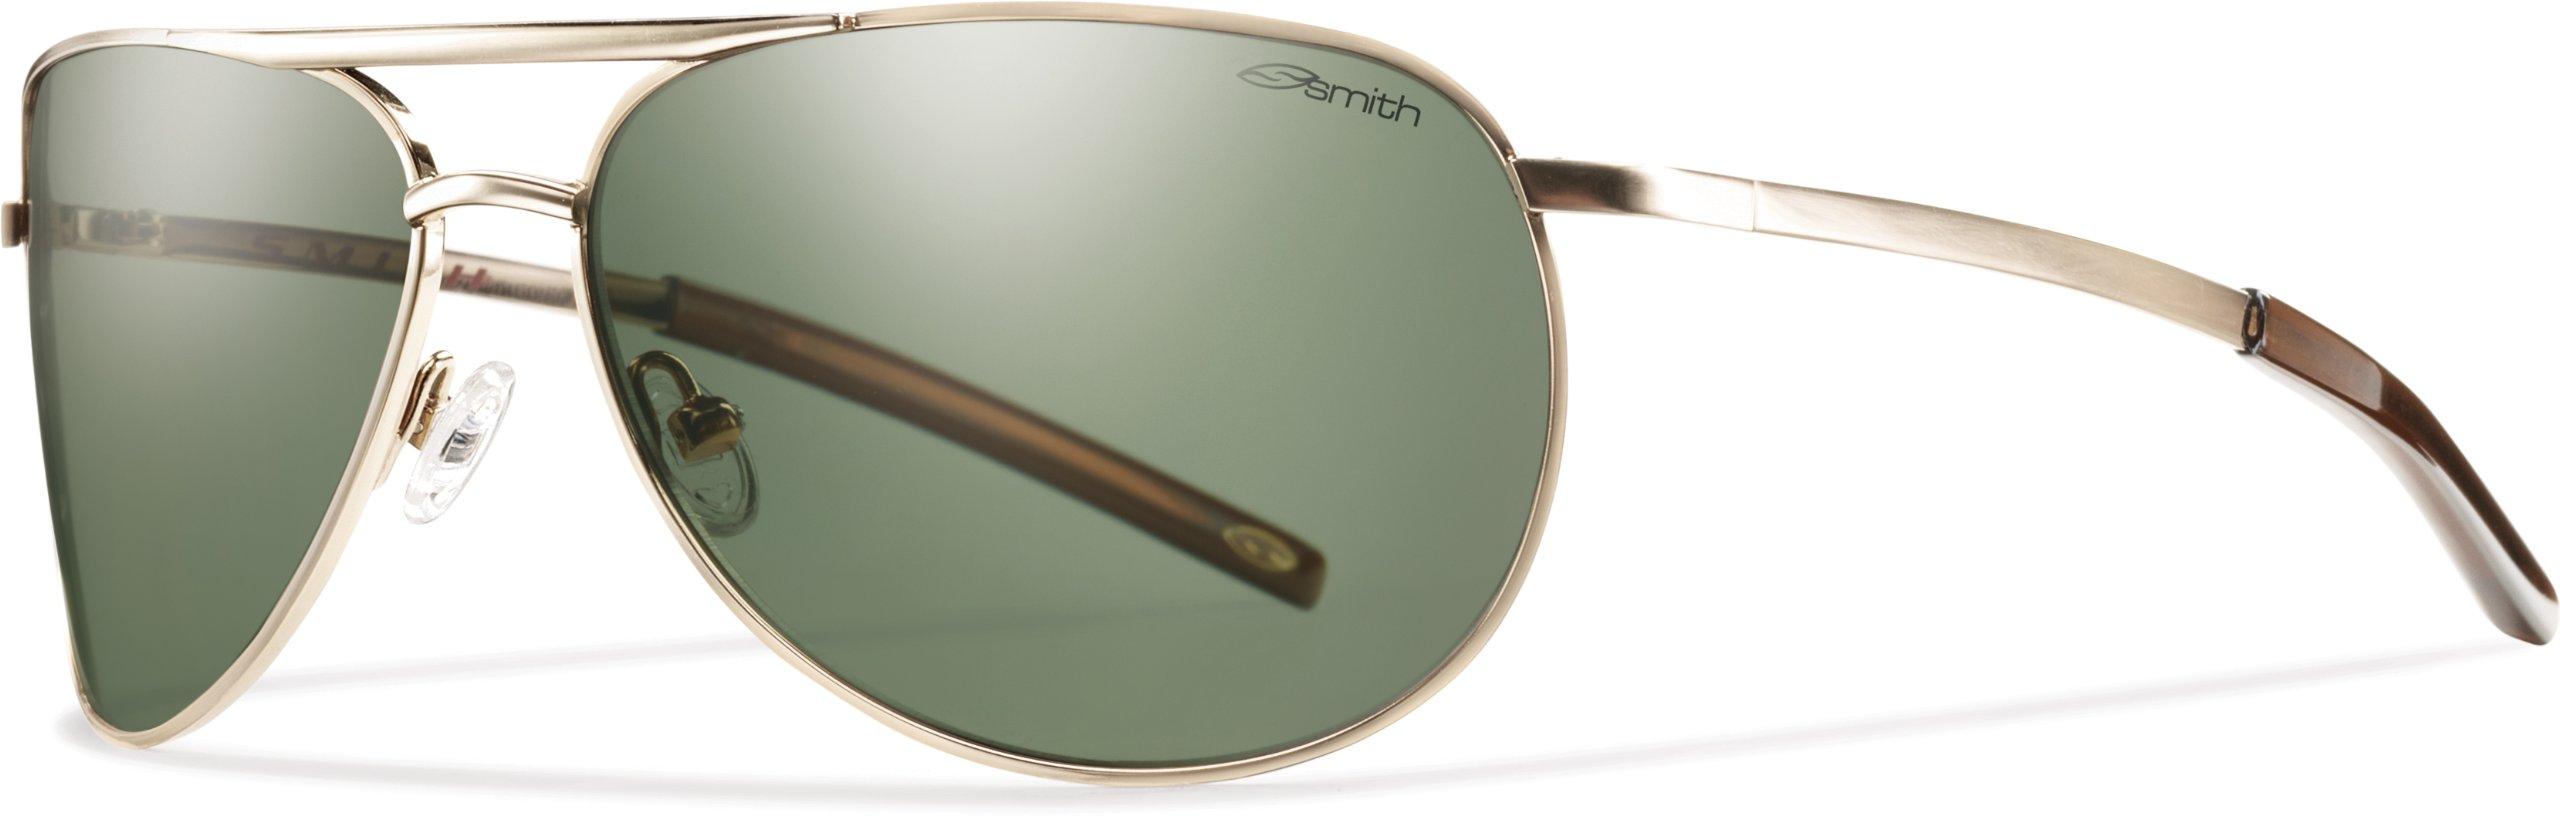 Smith Optics Serpico Slim Sunglass, Gold / Gray Green Polarized Polycarbonate by Smith Optics